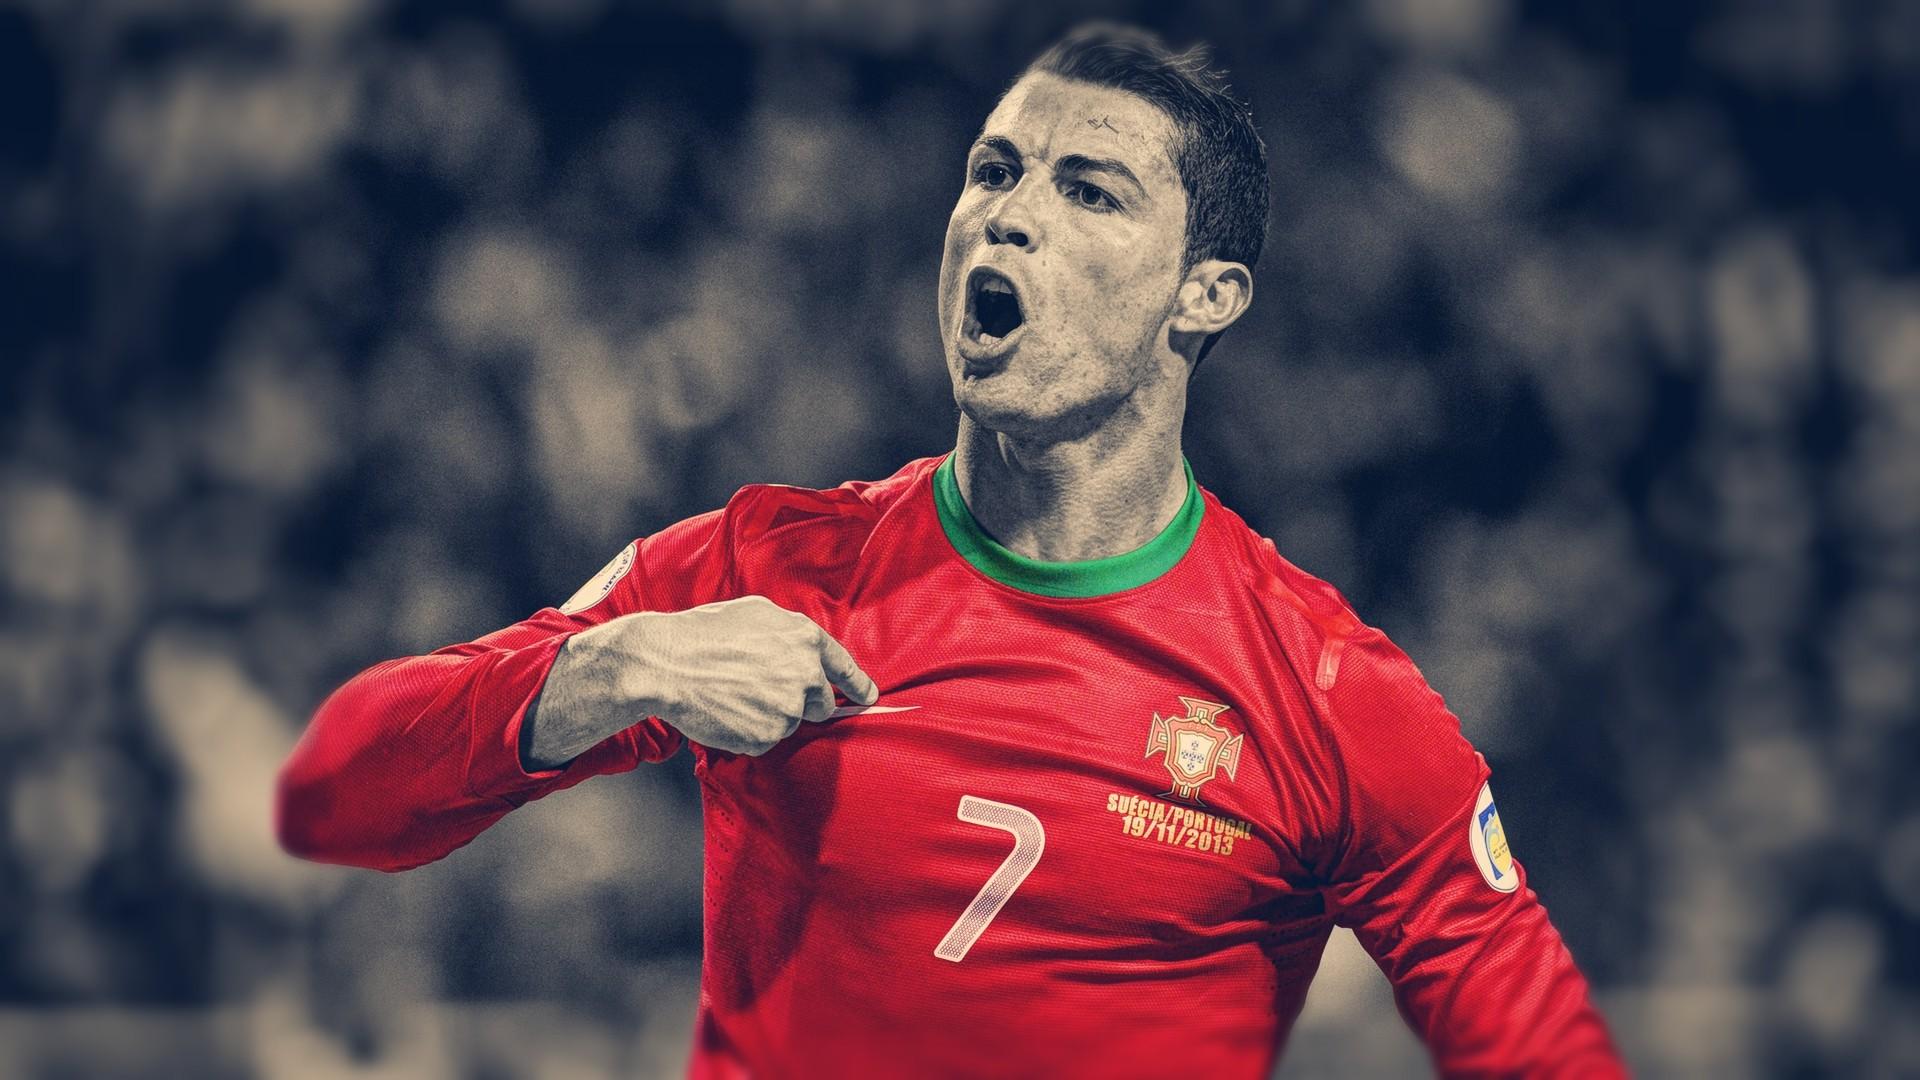 Fondos De Pantalla Deportes Rojo Hdr Portugal